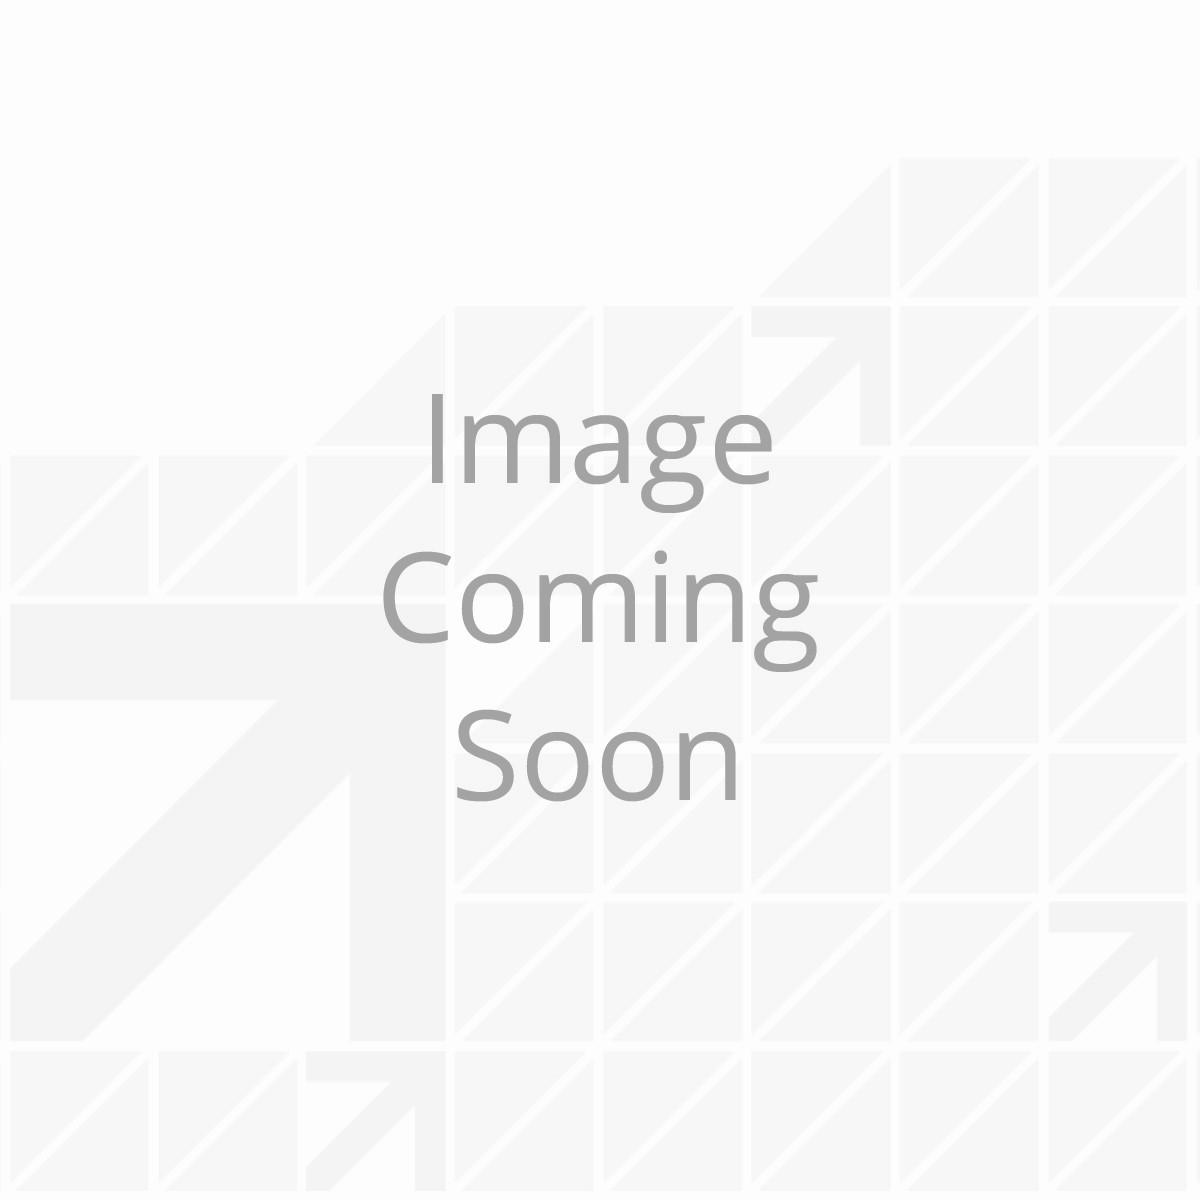 N2100 Alphaseal All Purpose RV Sealant - 10.3 Oz. Tube